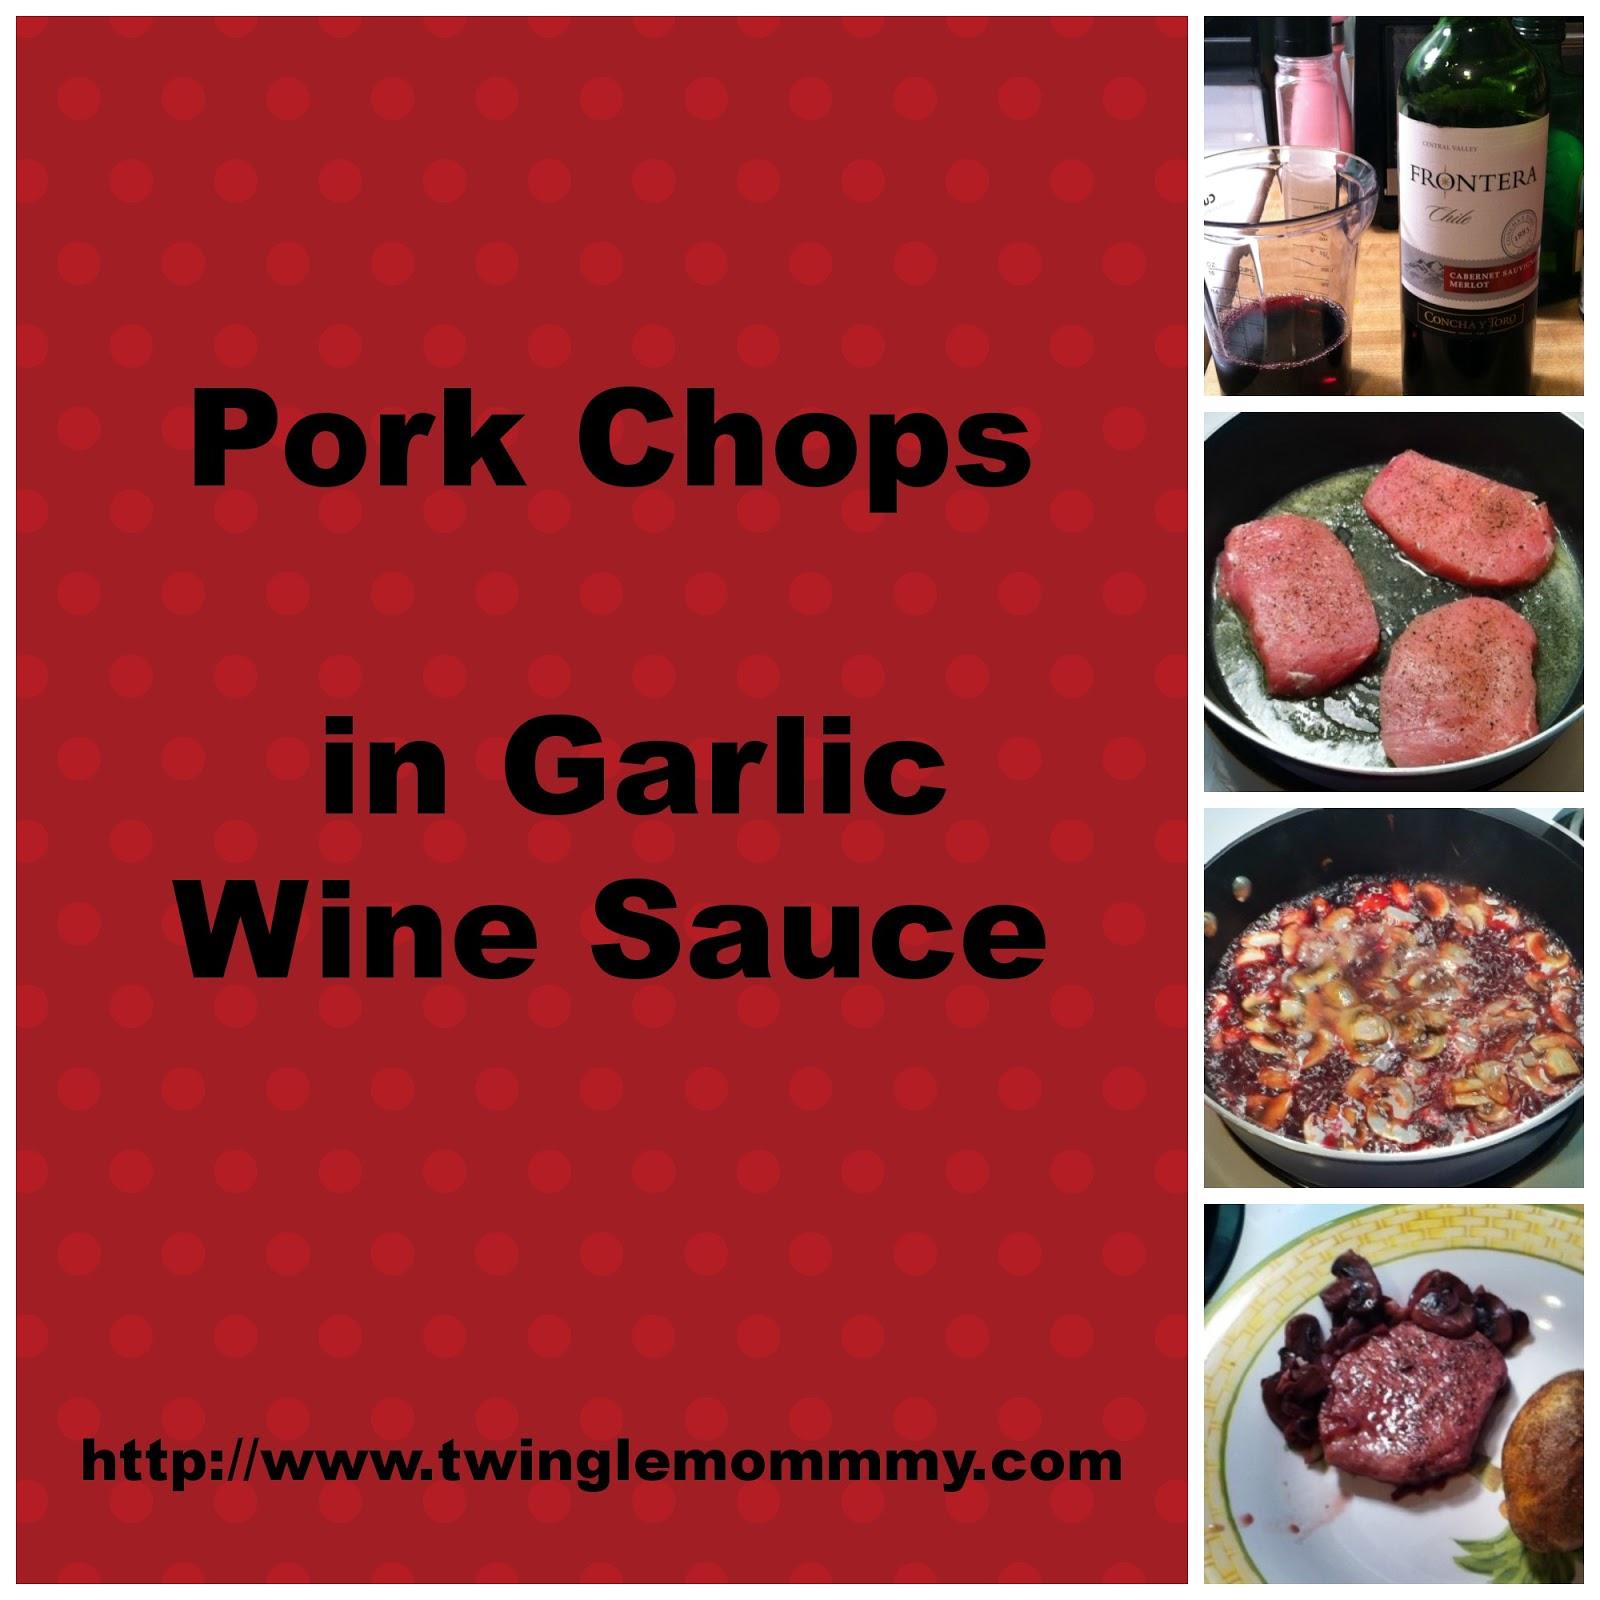 twingle mommmy: Pork Chops in Garlic Wine Sauce